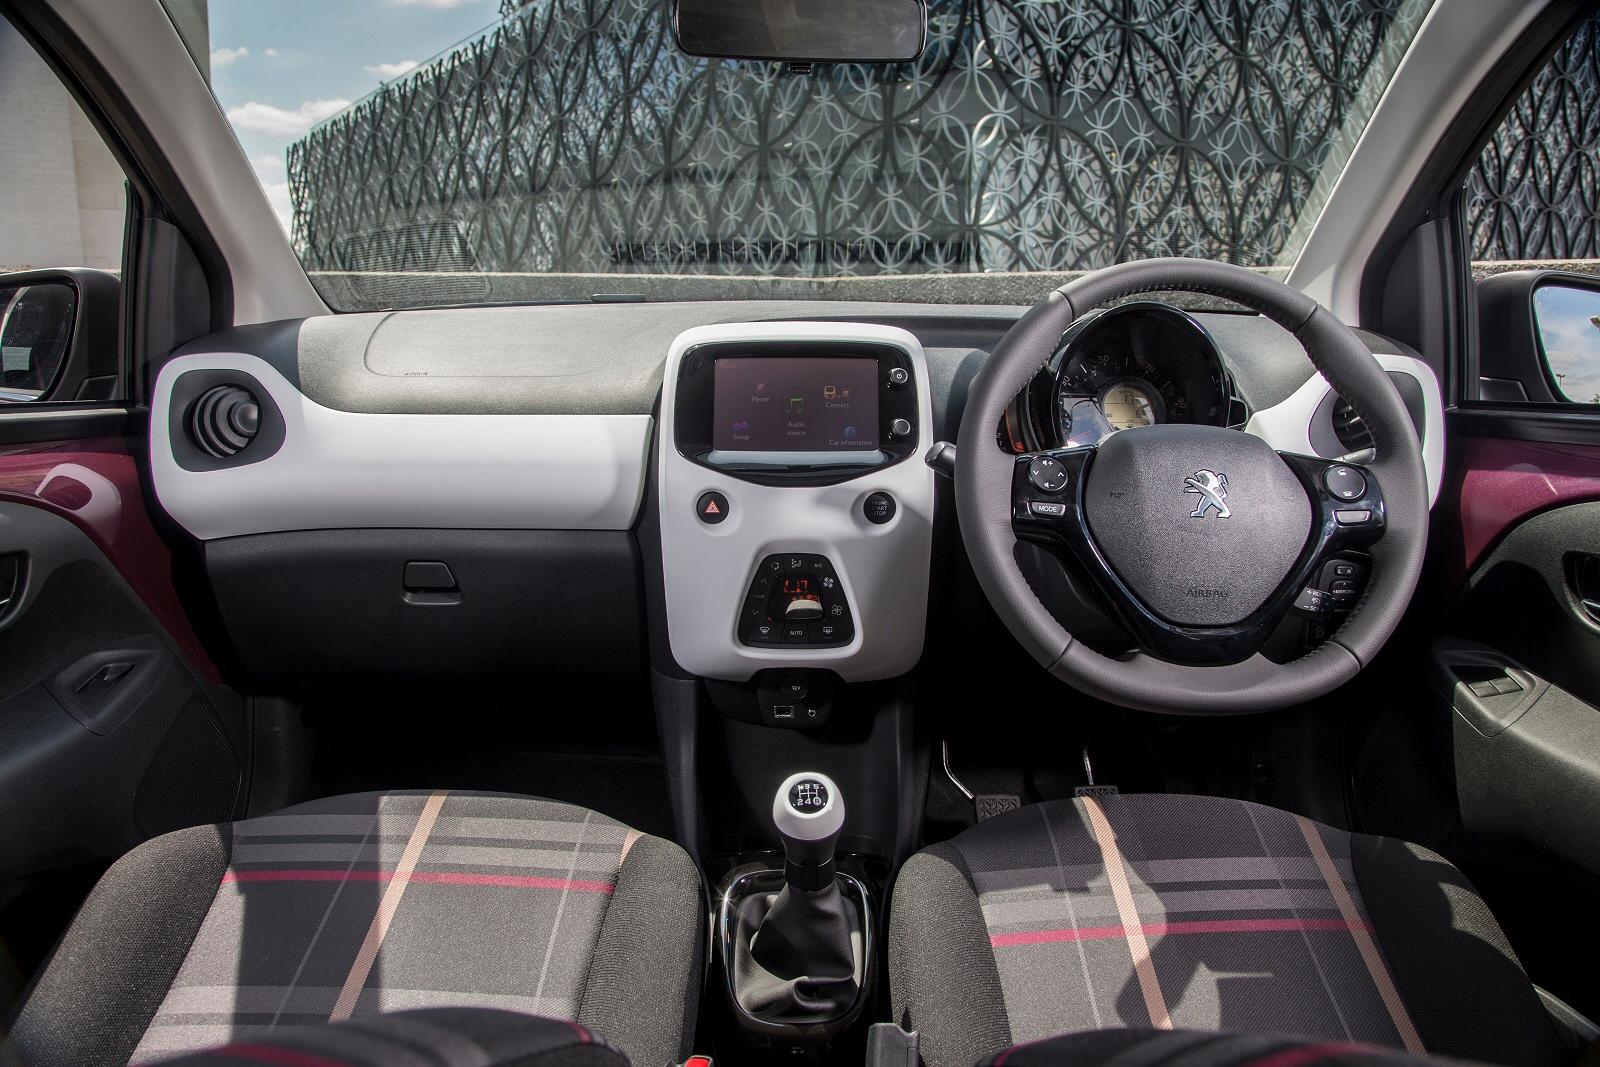 new peugeot 108 1.0 active 5dr 2-tronic petrol hatchback for sale